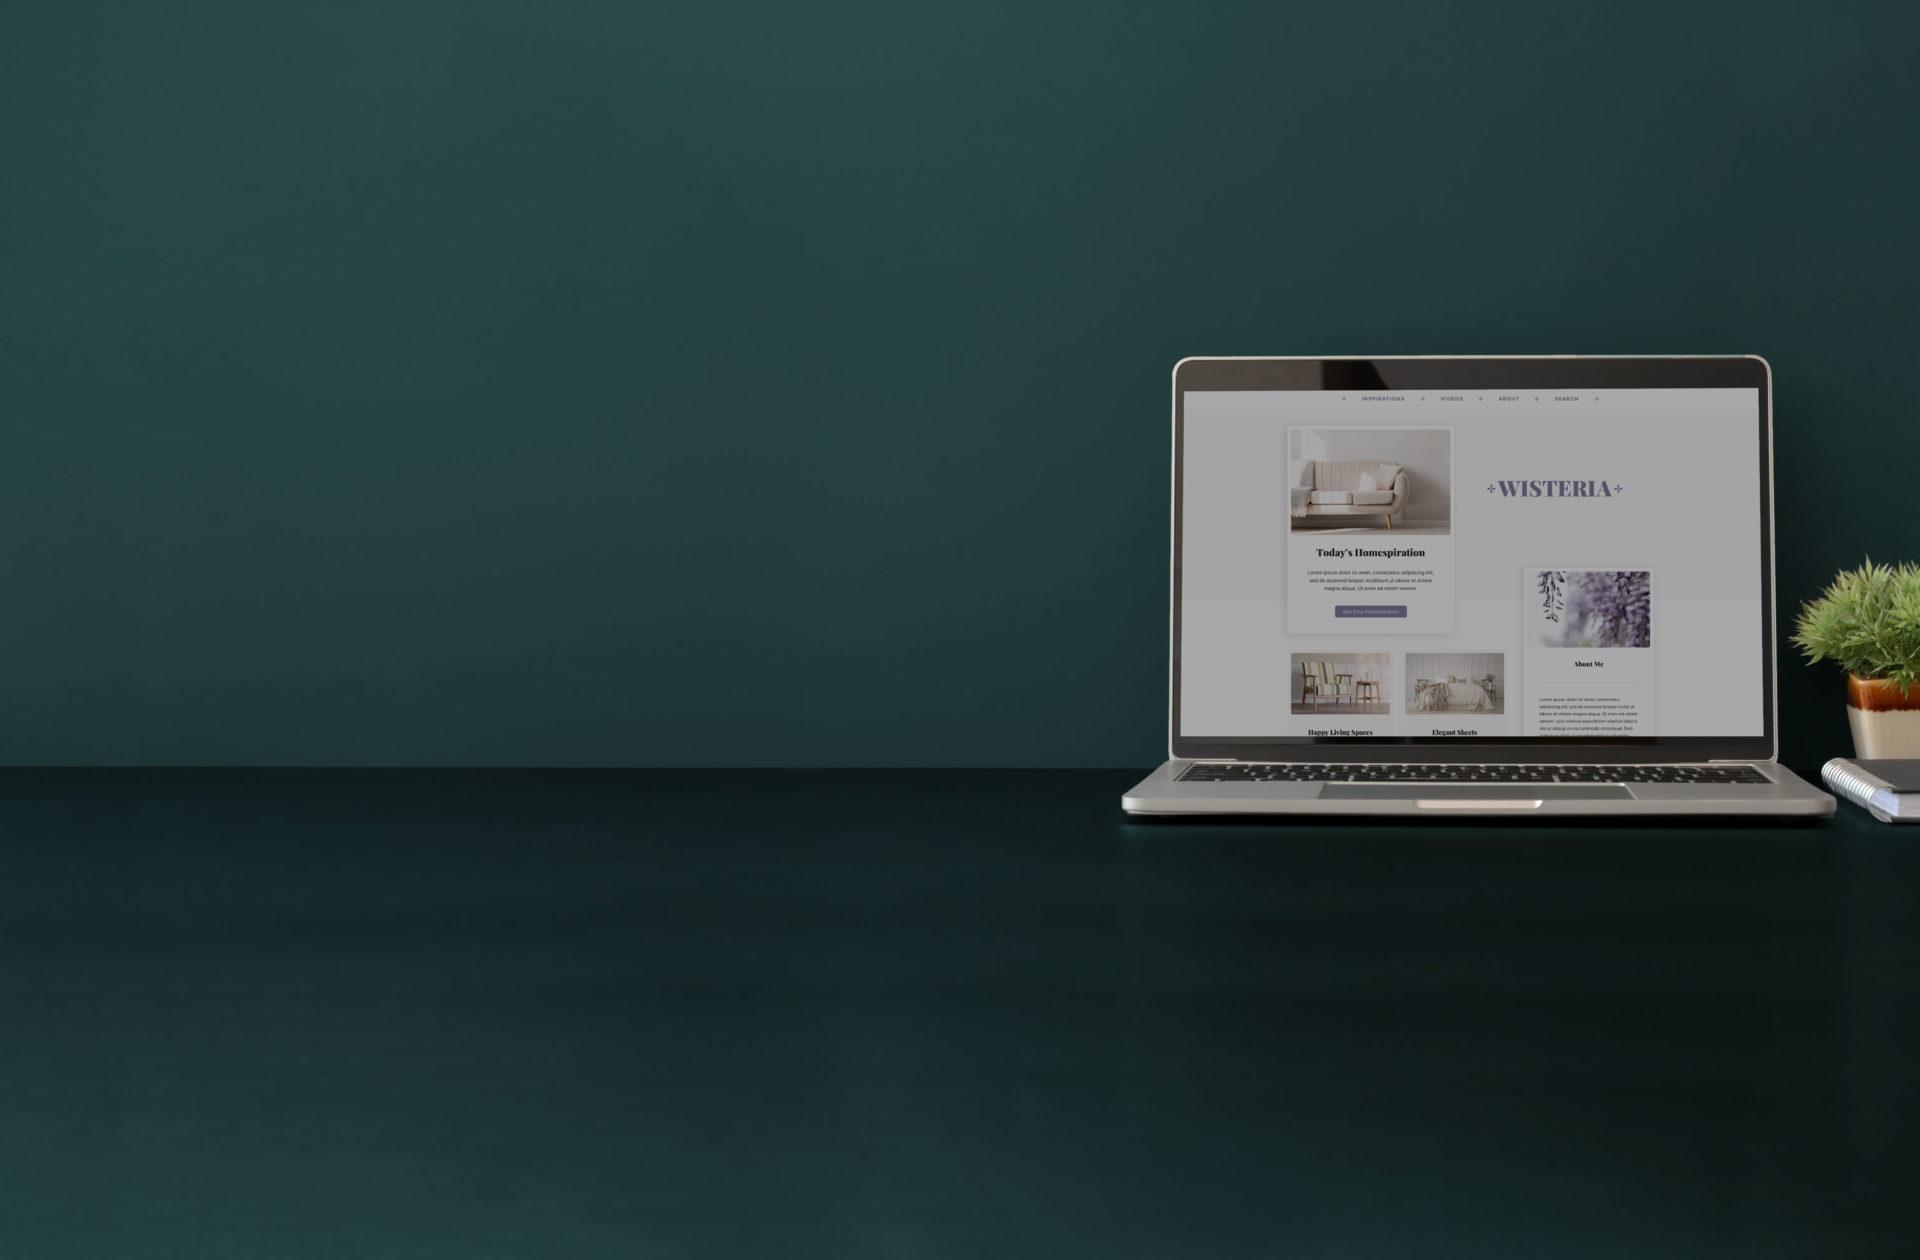 Wisteria screenshot on laptop